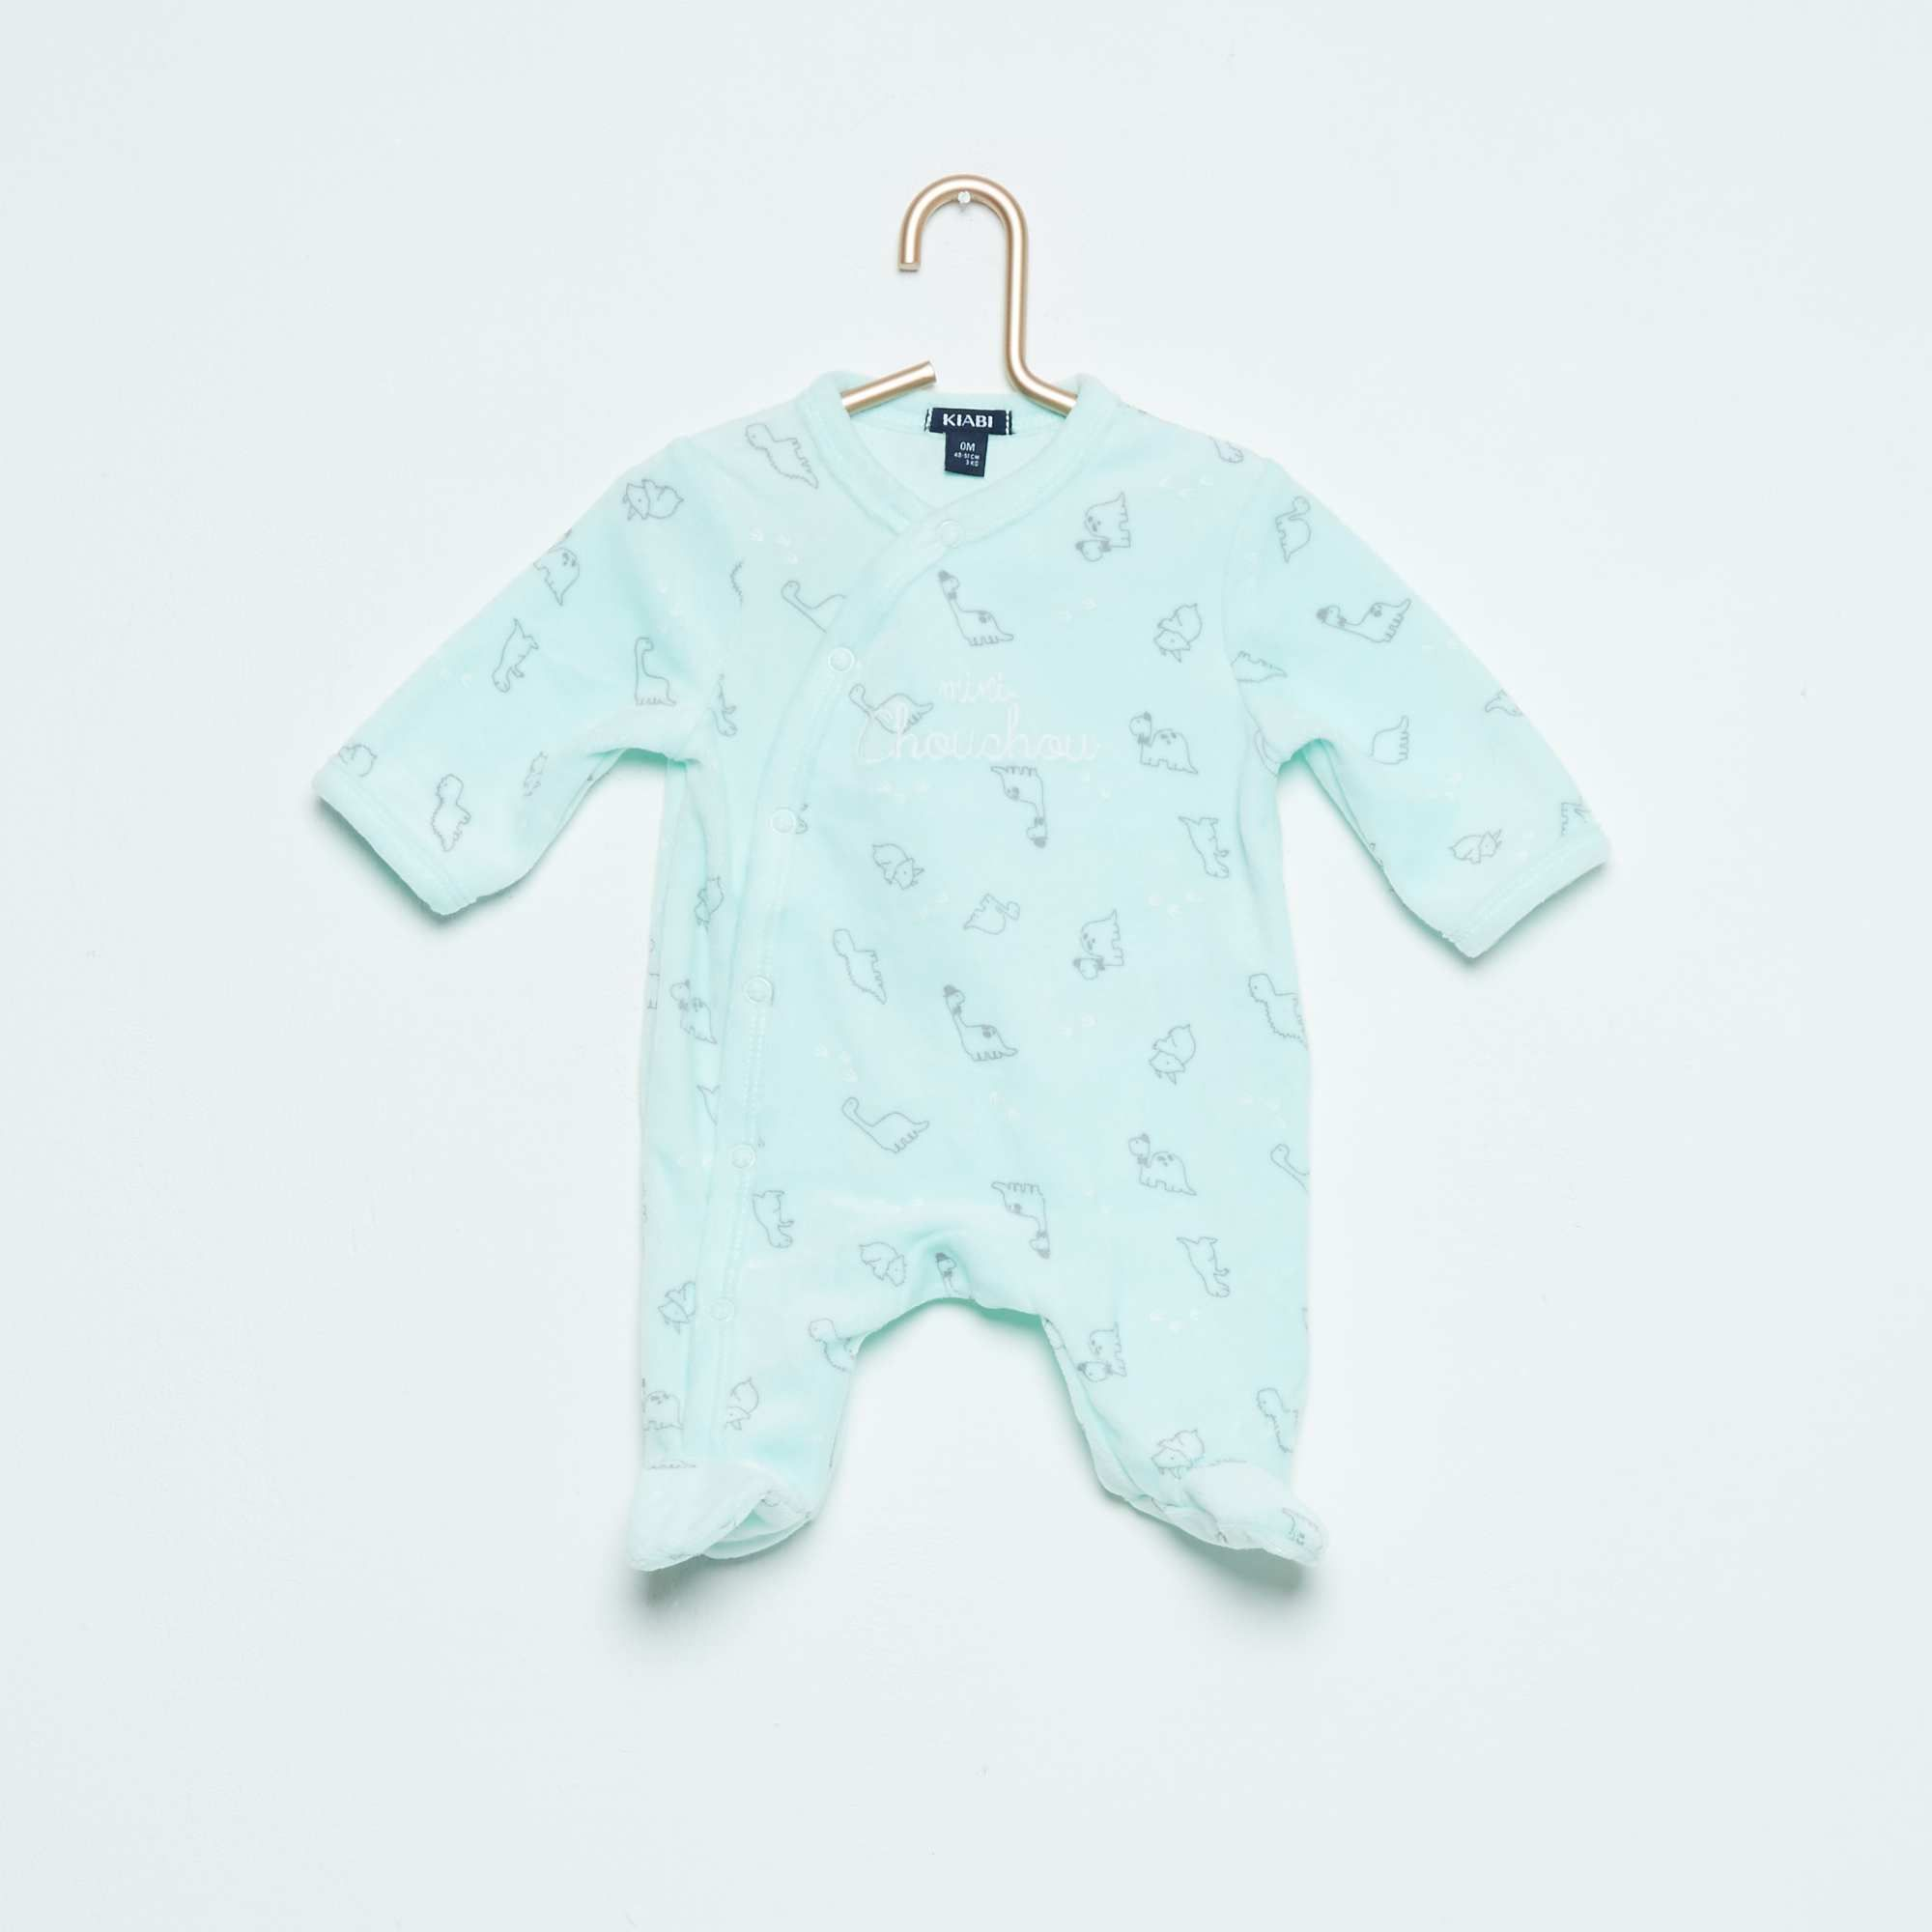 19d4c2fab3756 Pyjama en velours imprimé  mouton  Bébé garçon - Kiabi - 10